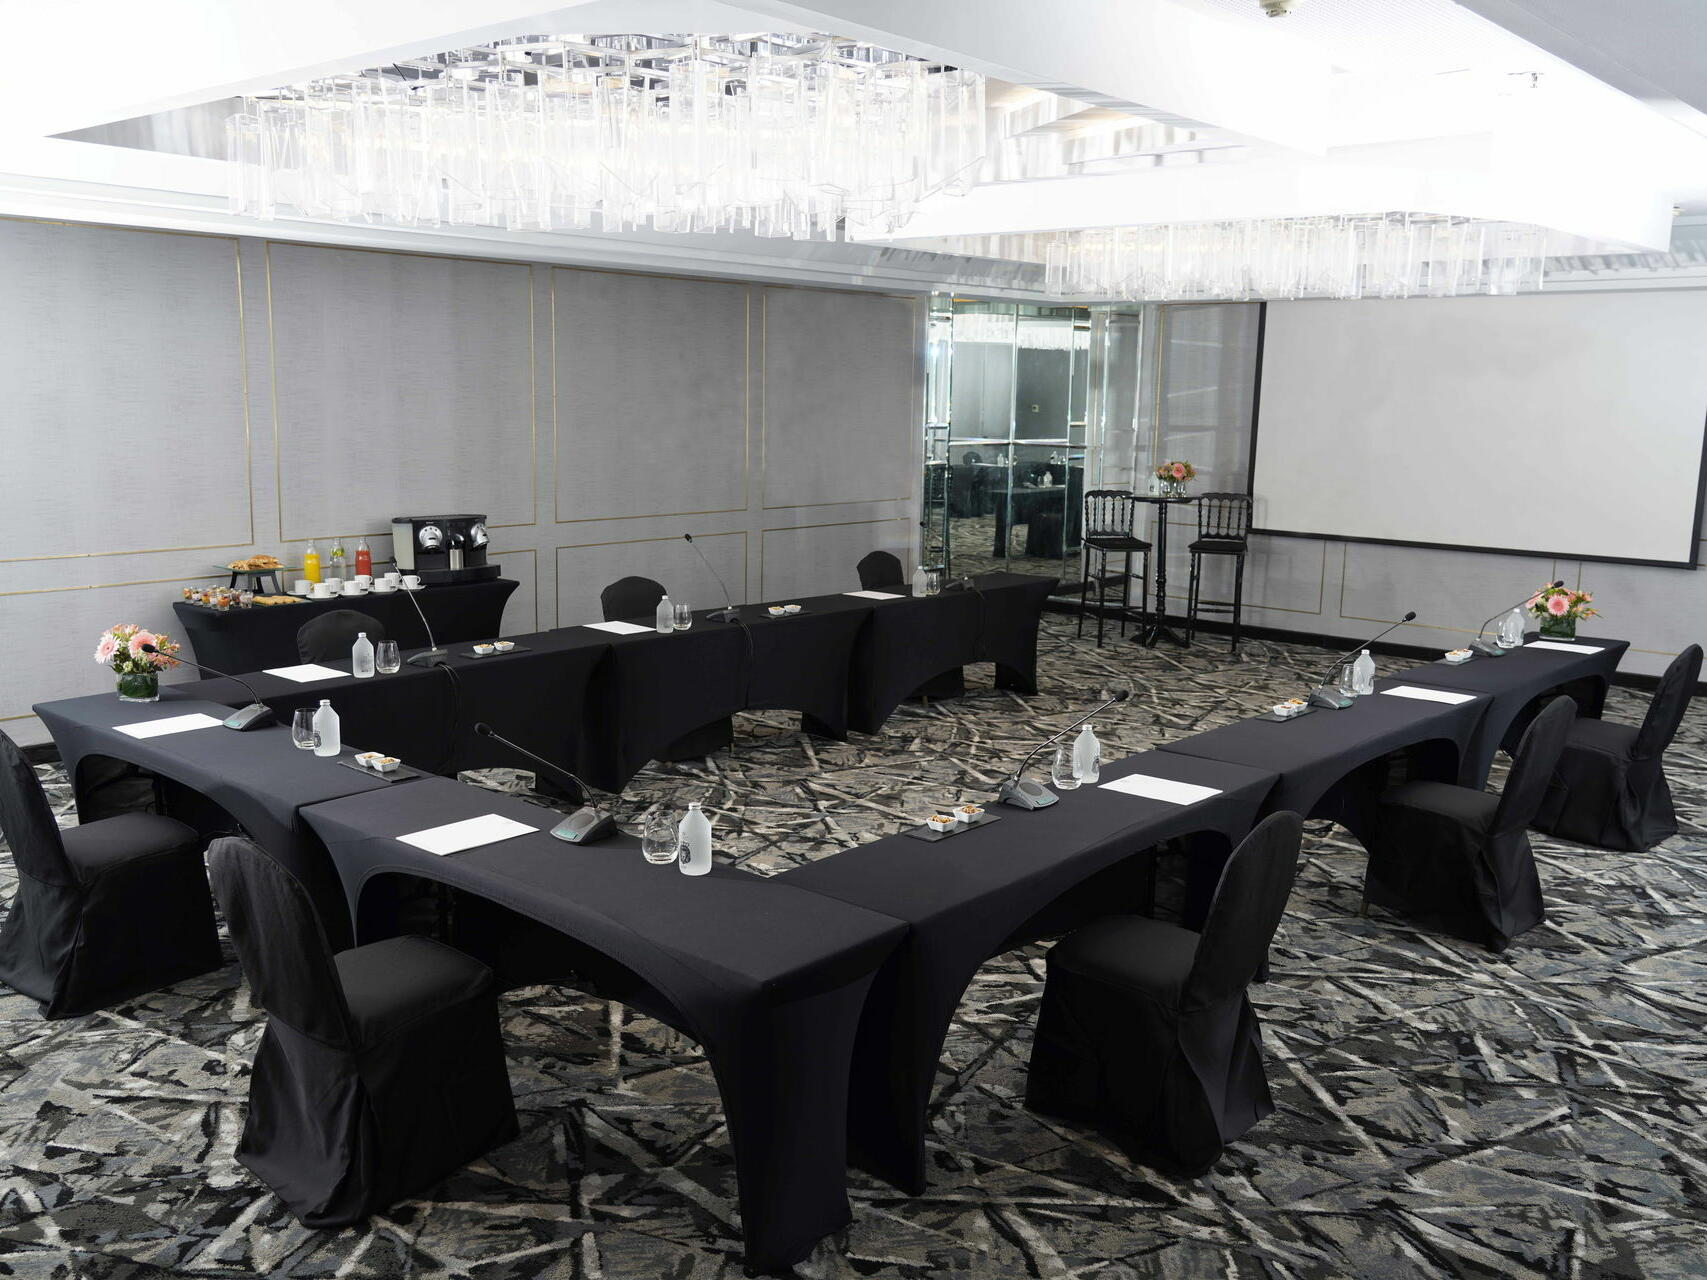 De La Castellana meeting room arranged with black tables and chairs at Hotel Emperador Buenos Aires